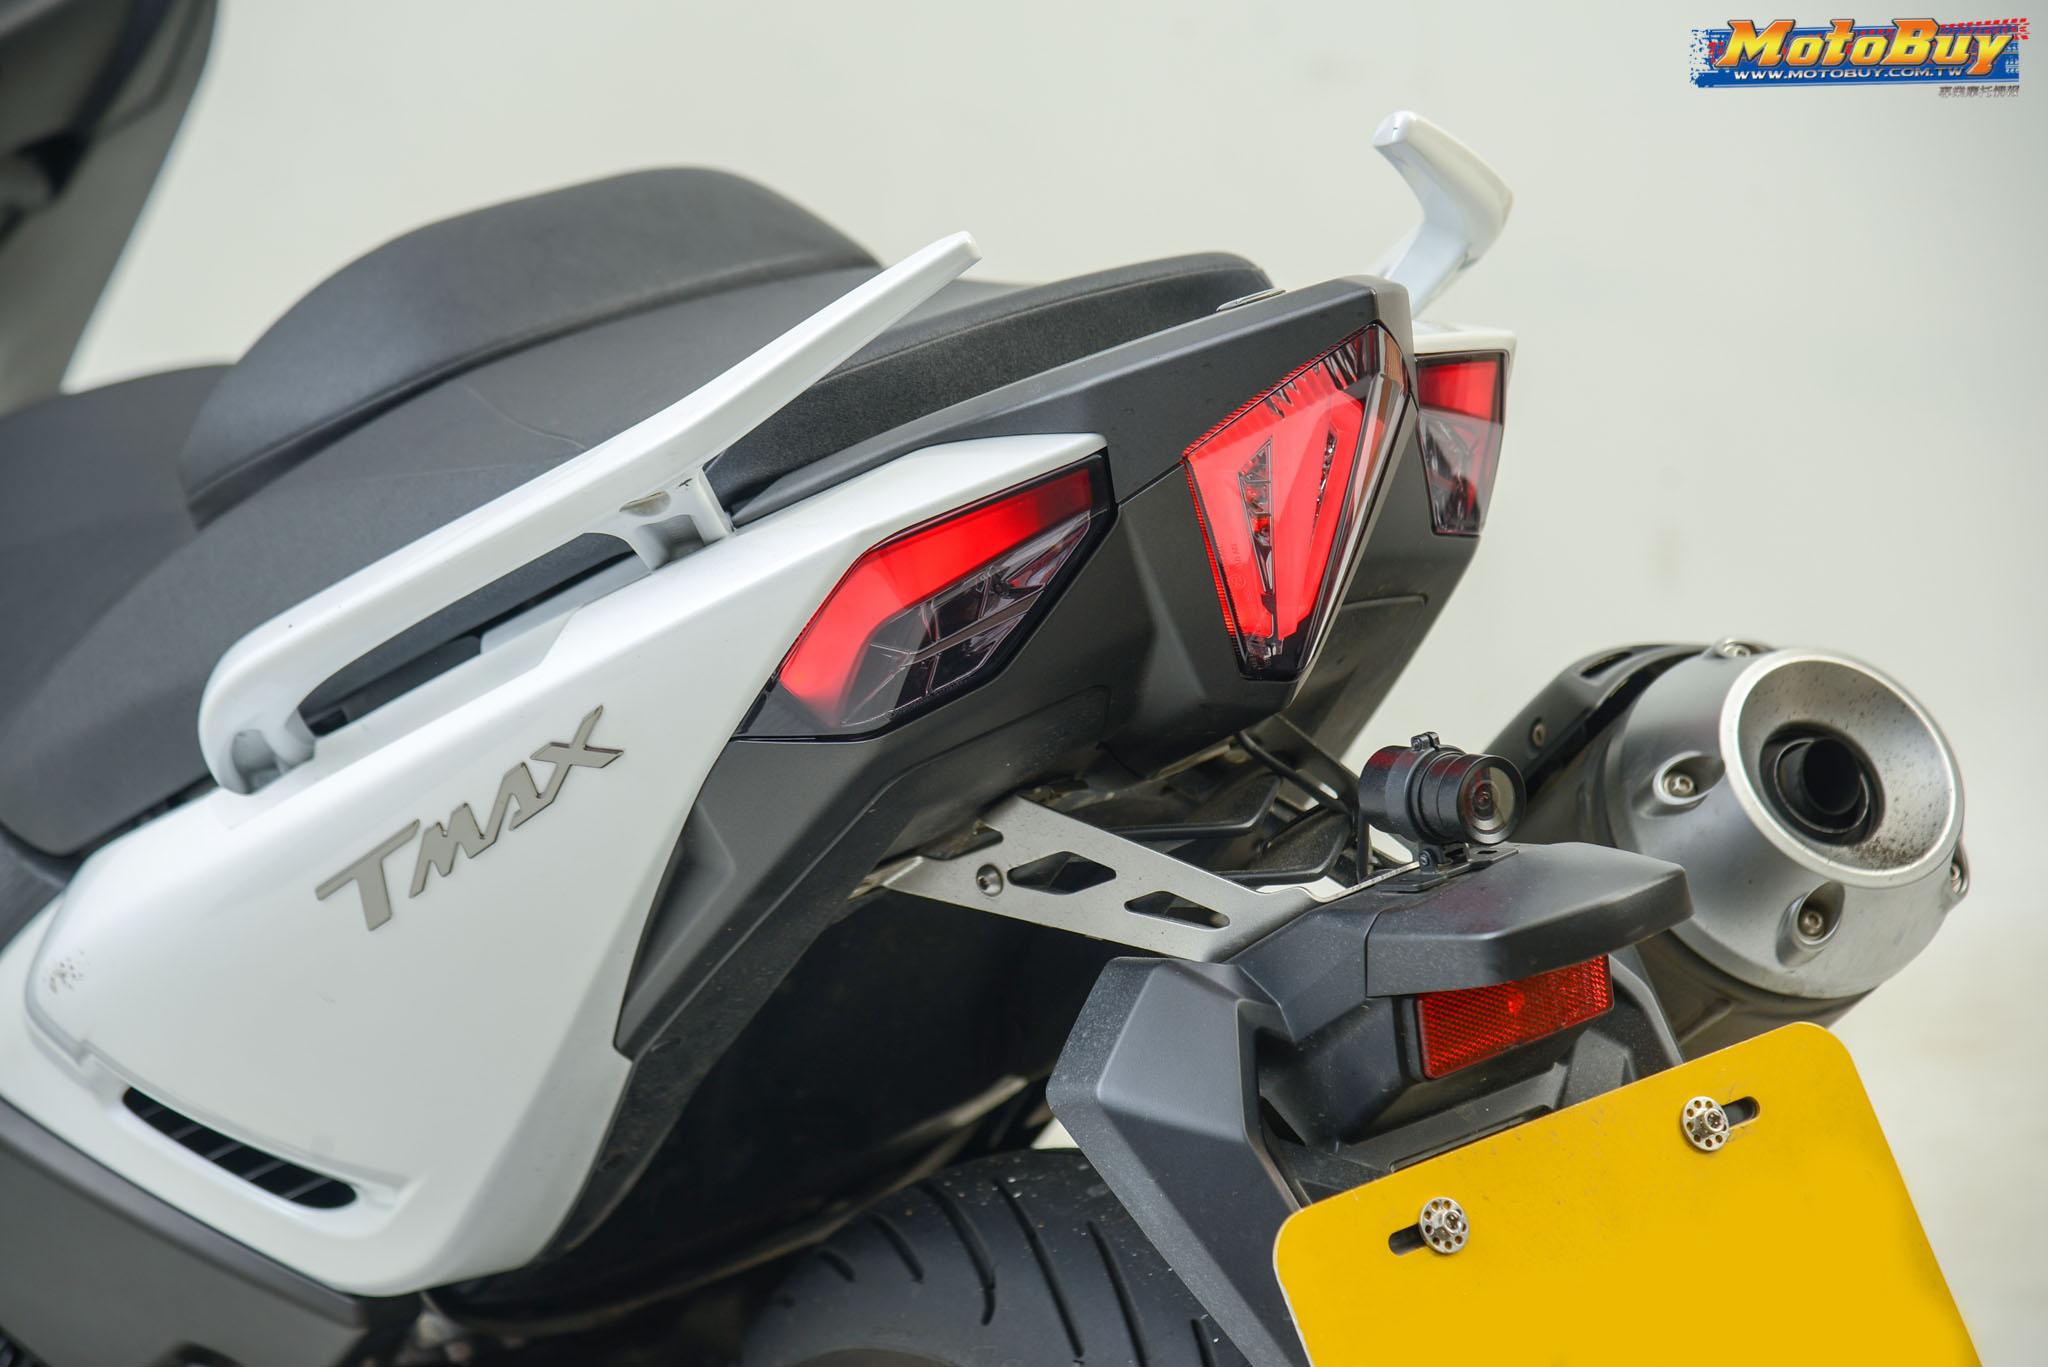 [部品情報] 流線導光自由變化! LEVEL10 TMAX530燈系套件   MotoBuy